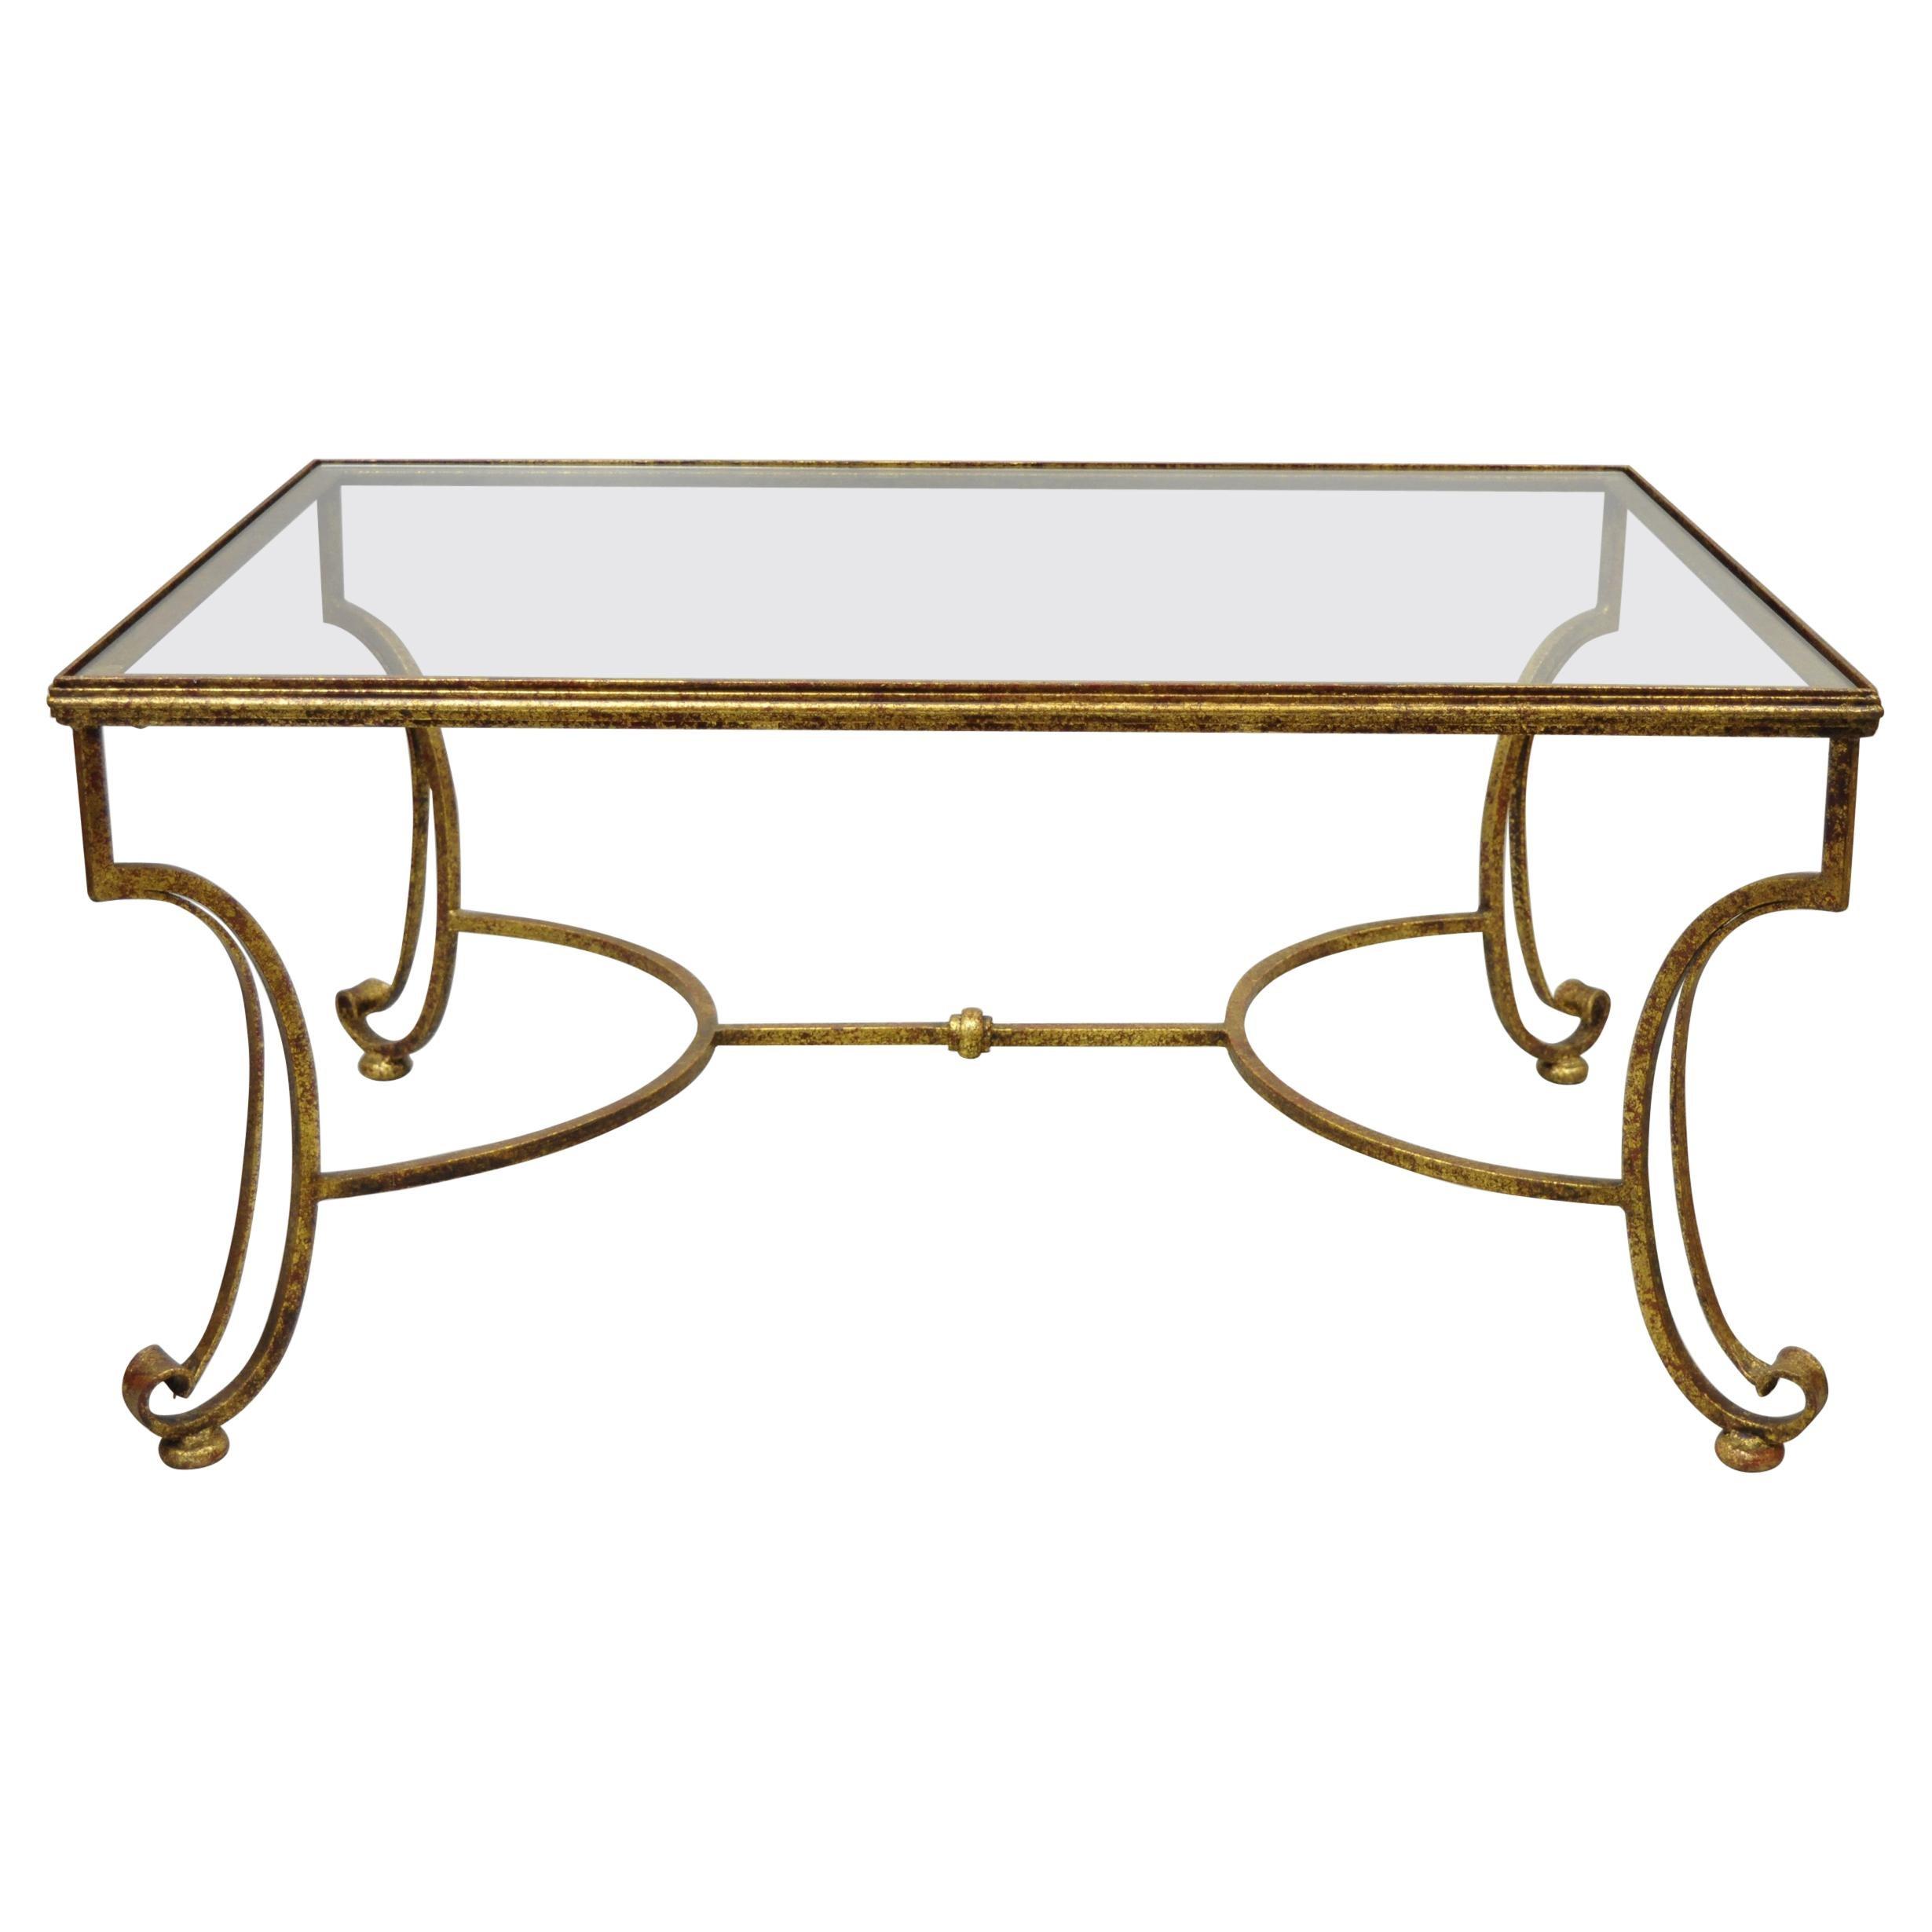 Gold Gilt Iron Glass Top Italian Hollywood Regency Rectangular Coffee Table